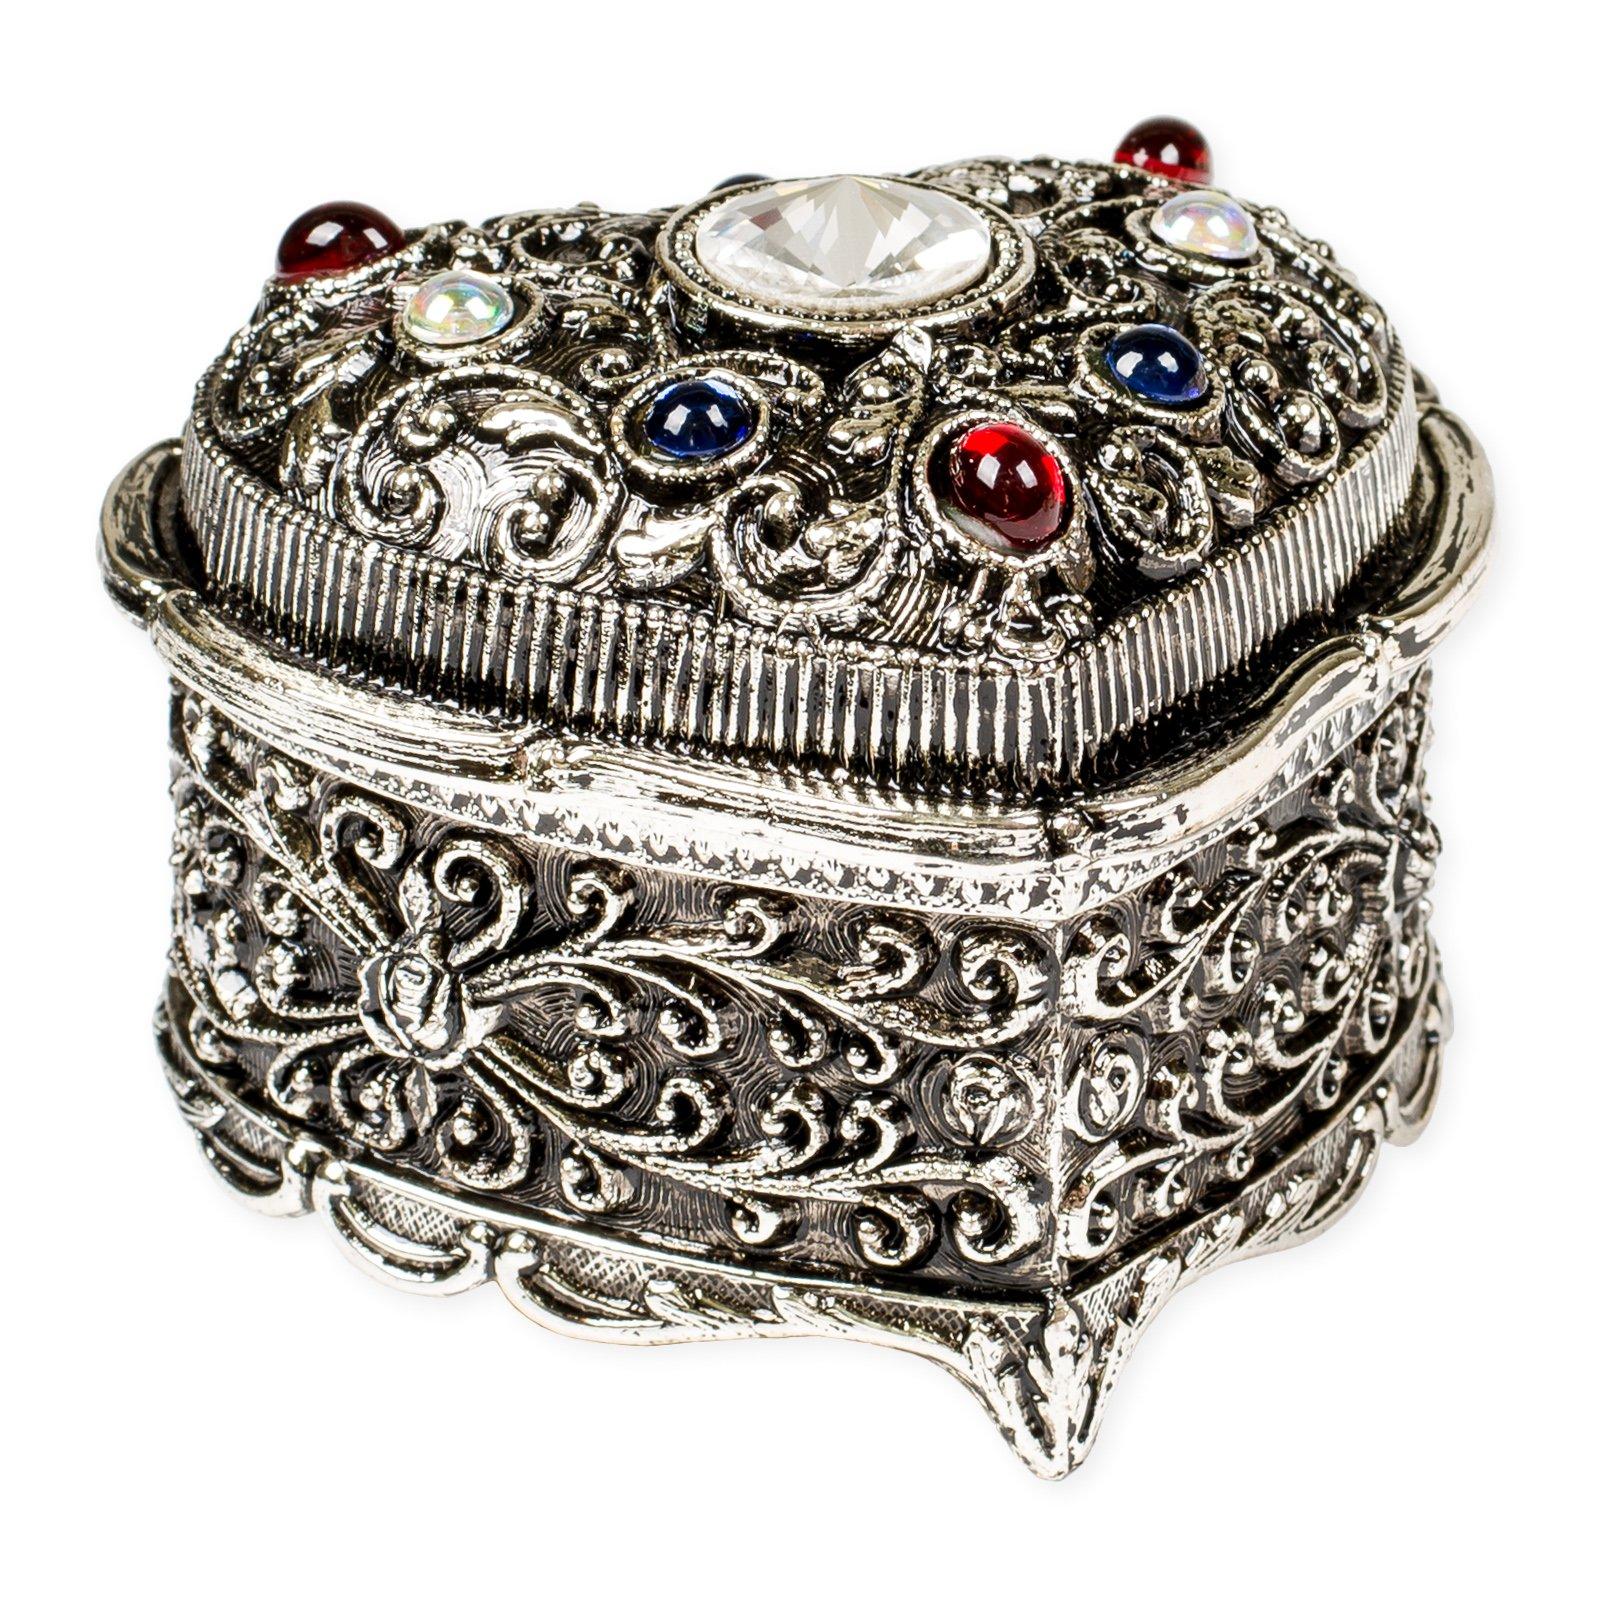 Heart Shaped Swarovski Crystal Jewel Silver Tone Metal Music Box Plays Tune My Heart Will Go On